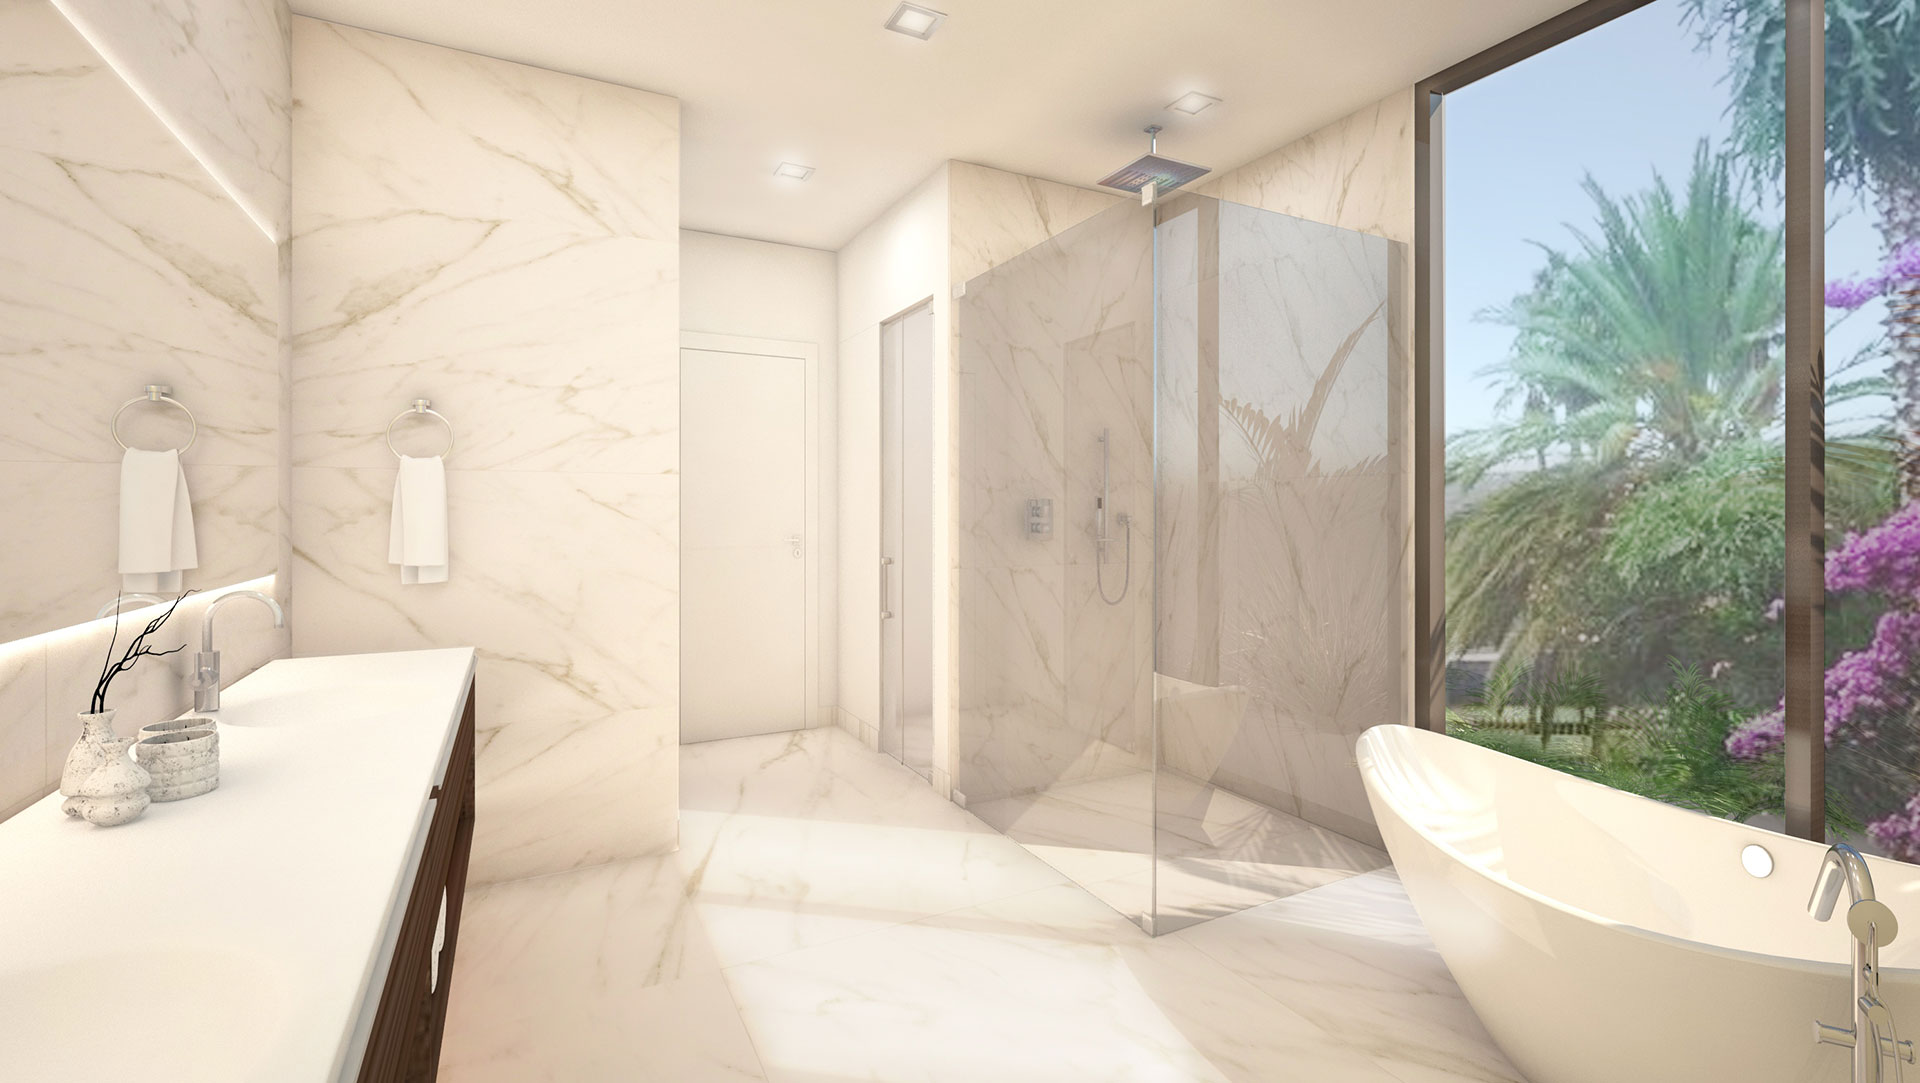 Interior Design front vew bathroom project in Douglas RD, Florida